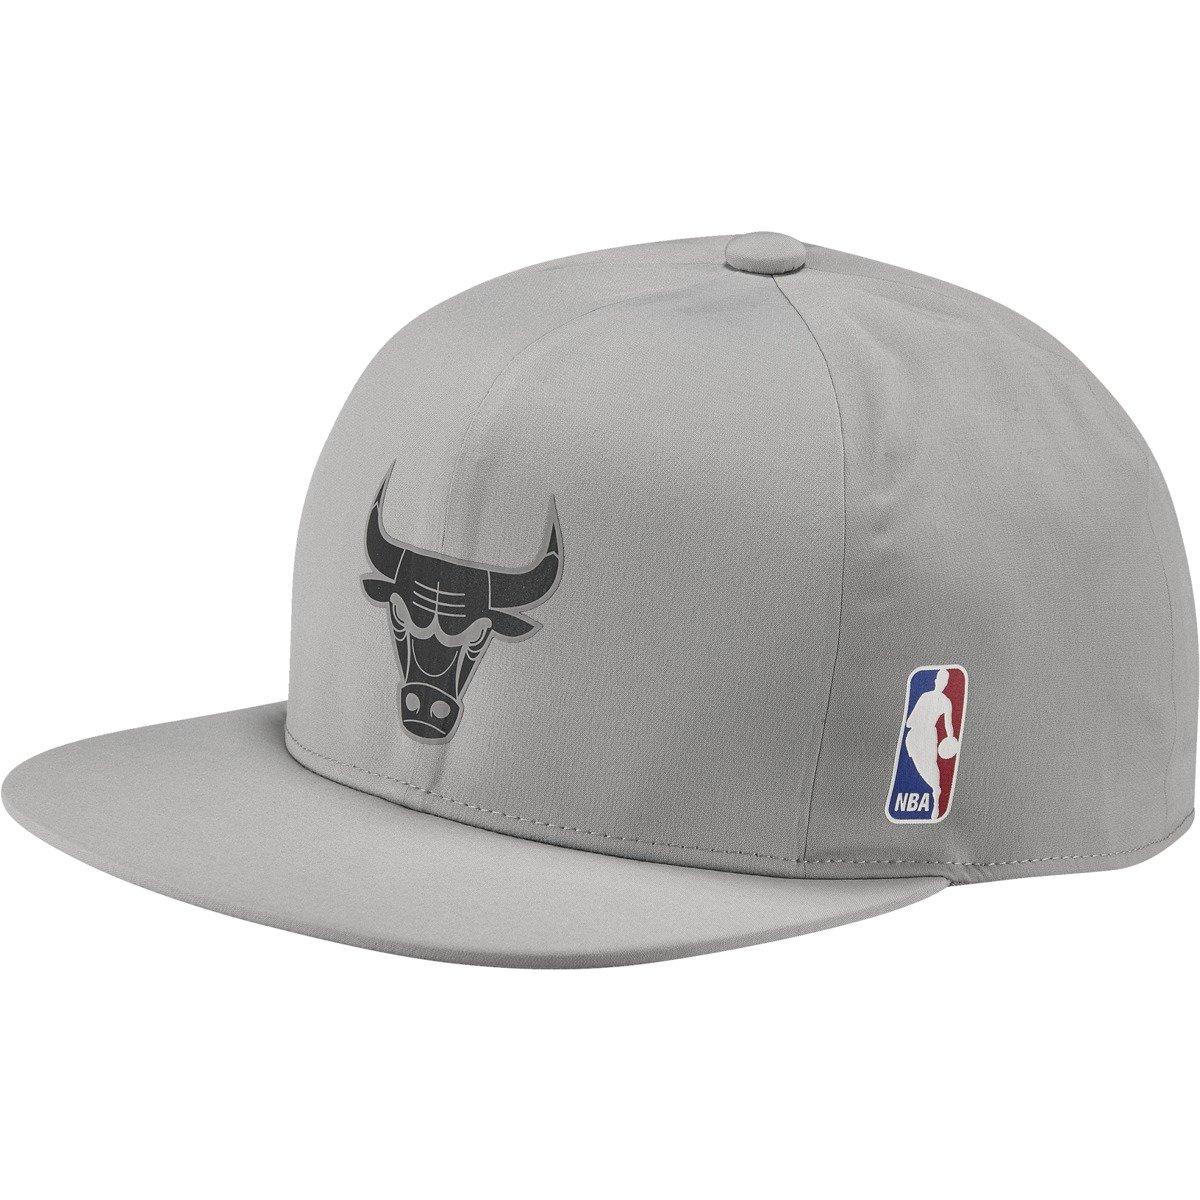 cfd77b73346 Czapka NBA Adidas Chicago Bulls Snapback - BK7413